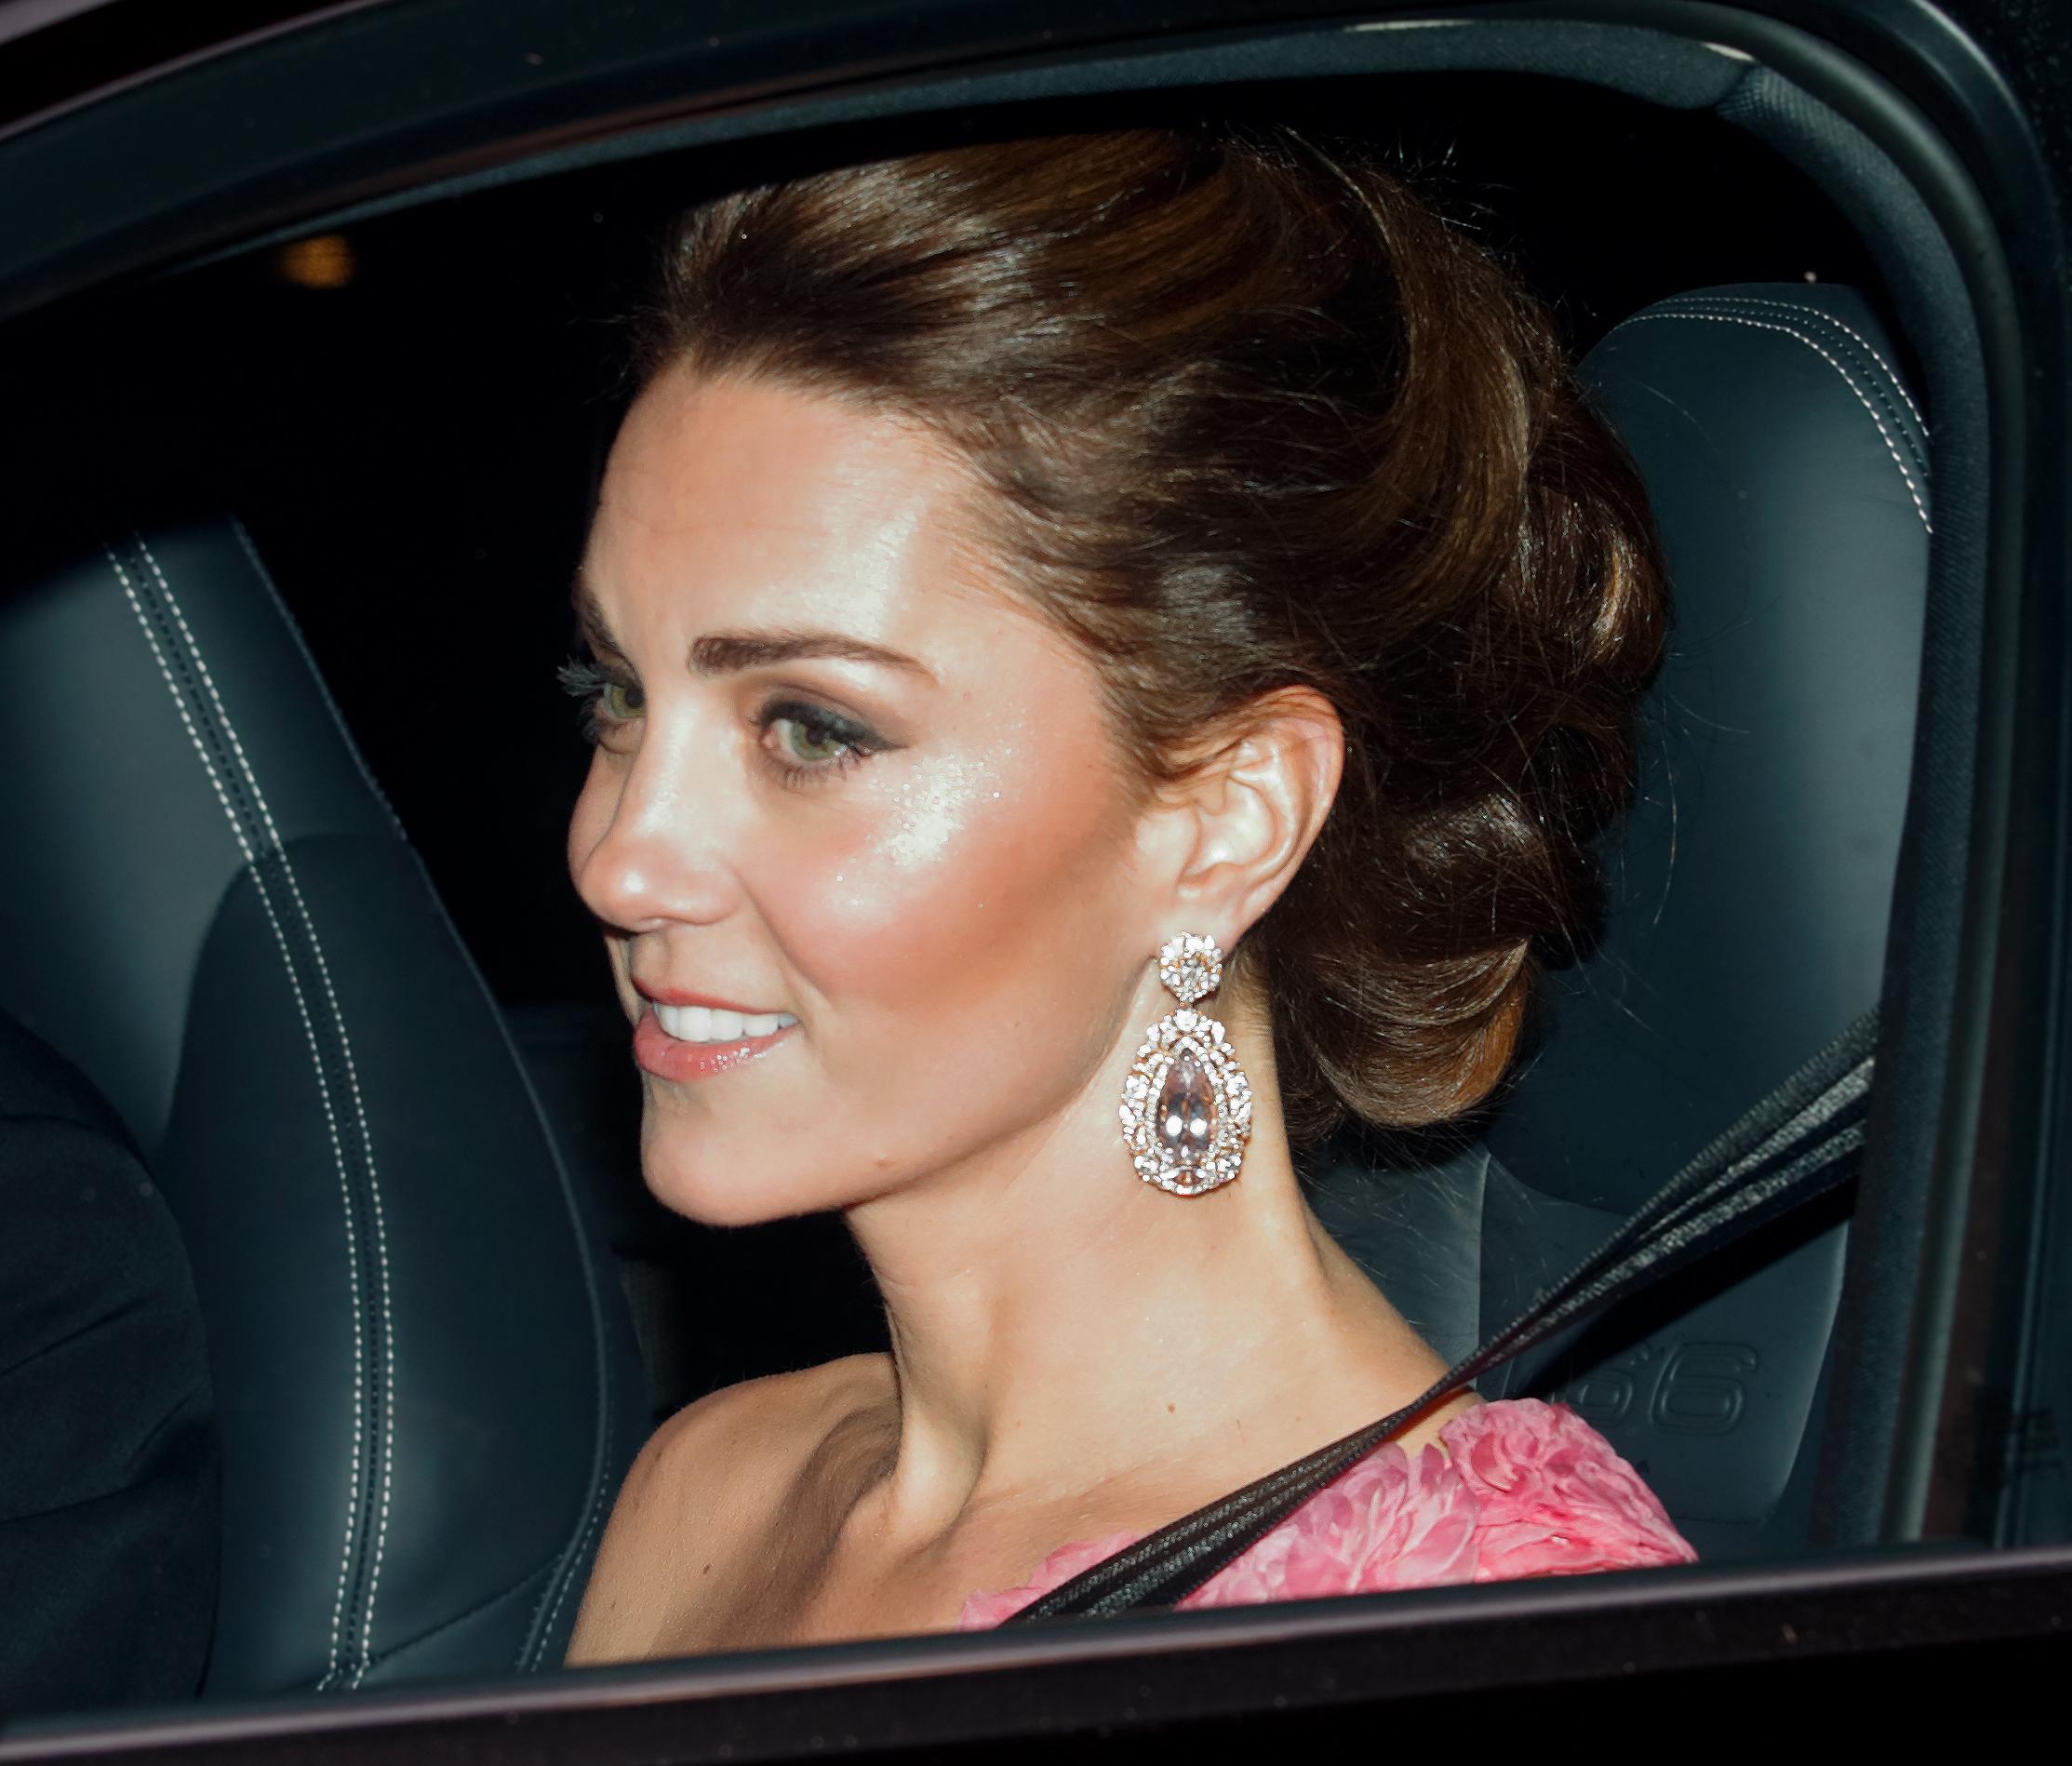 Kate Middleton, estilo, belleza, maquillaje, pendientes